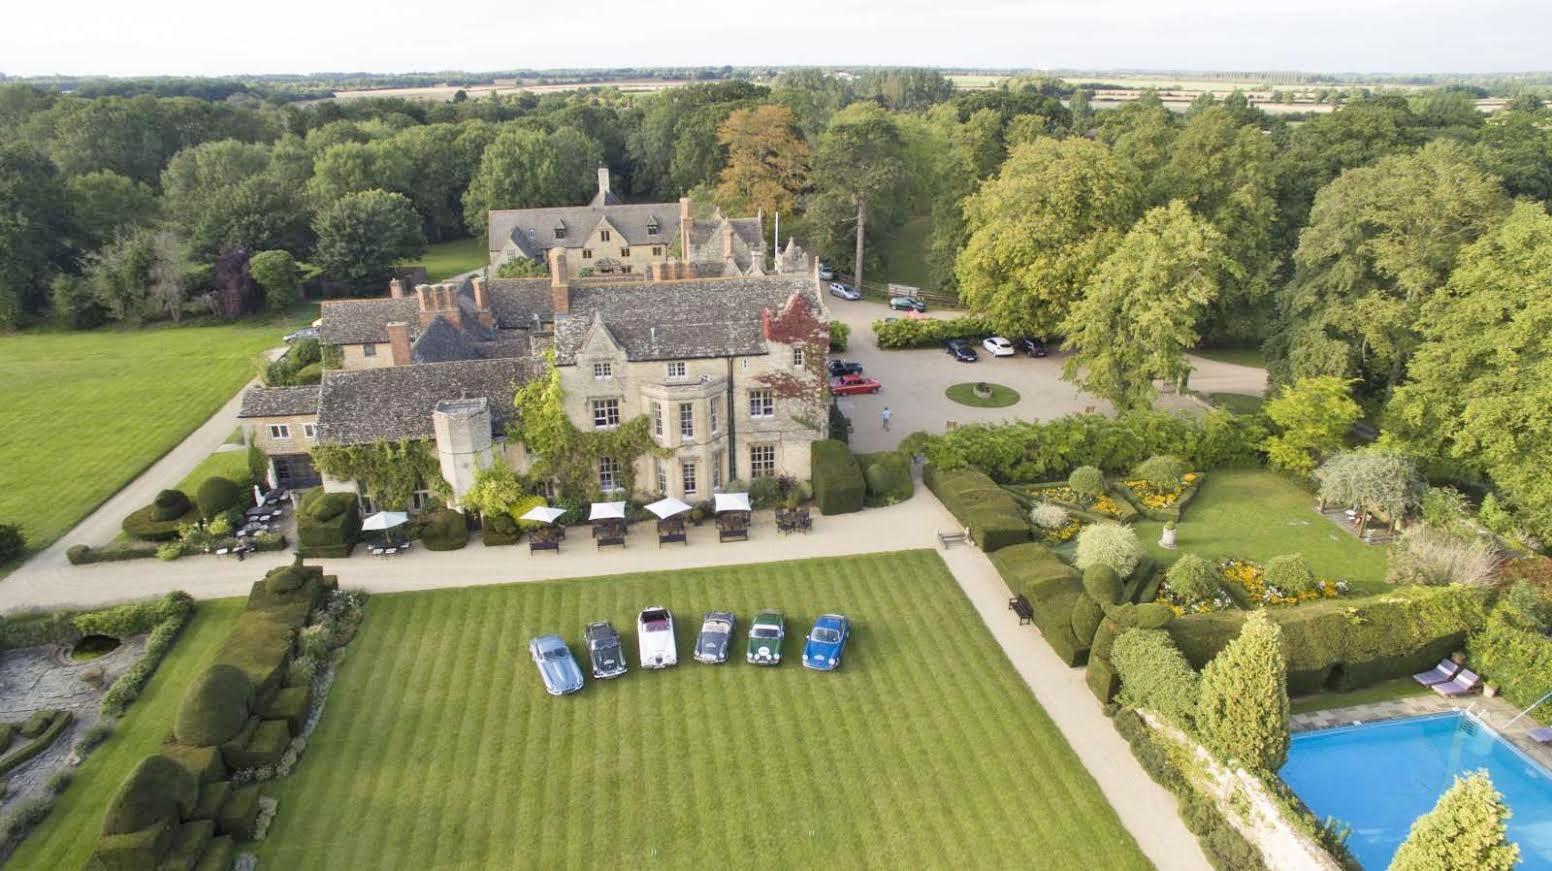 The Manor Weston